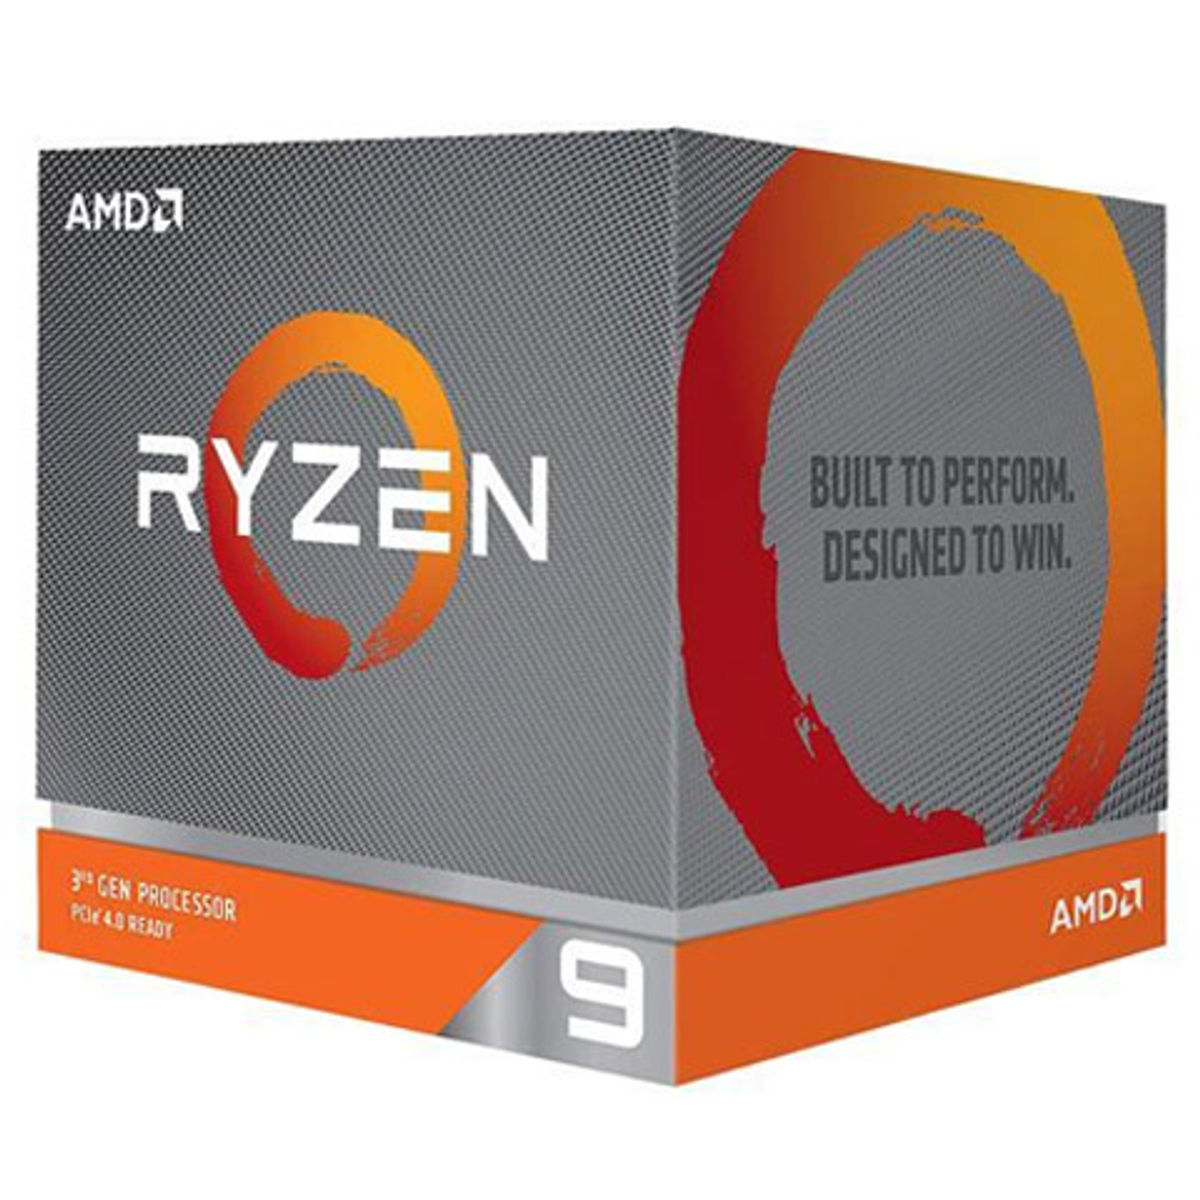 एएमडी Ryzen 9 3900X